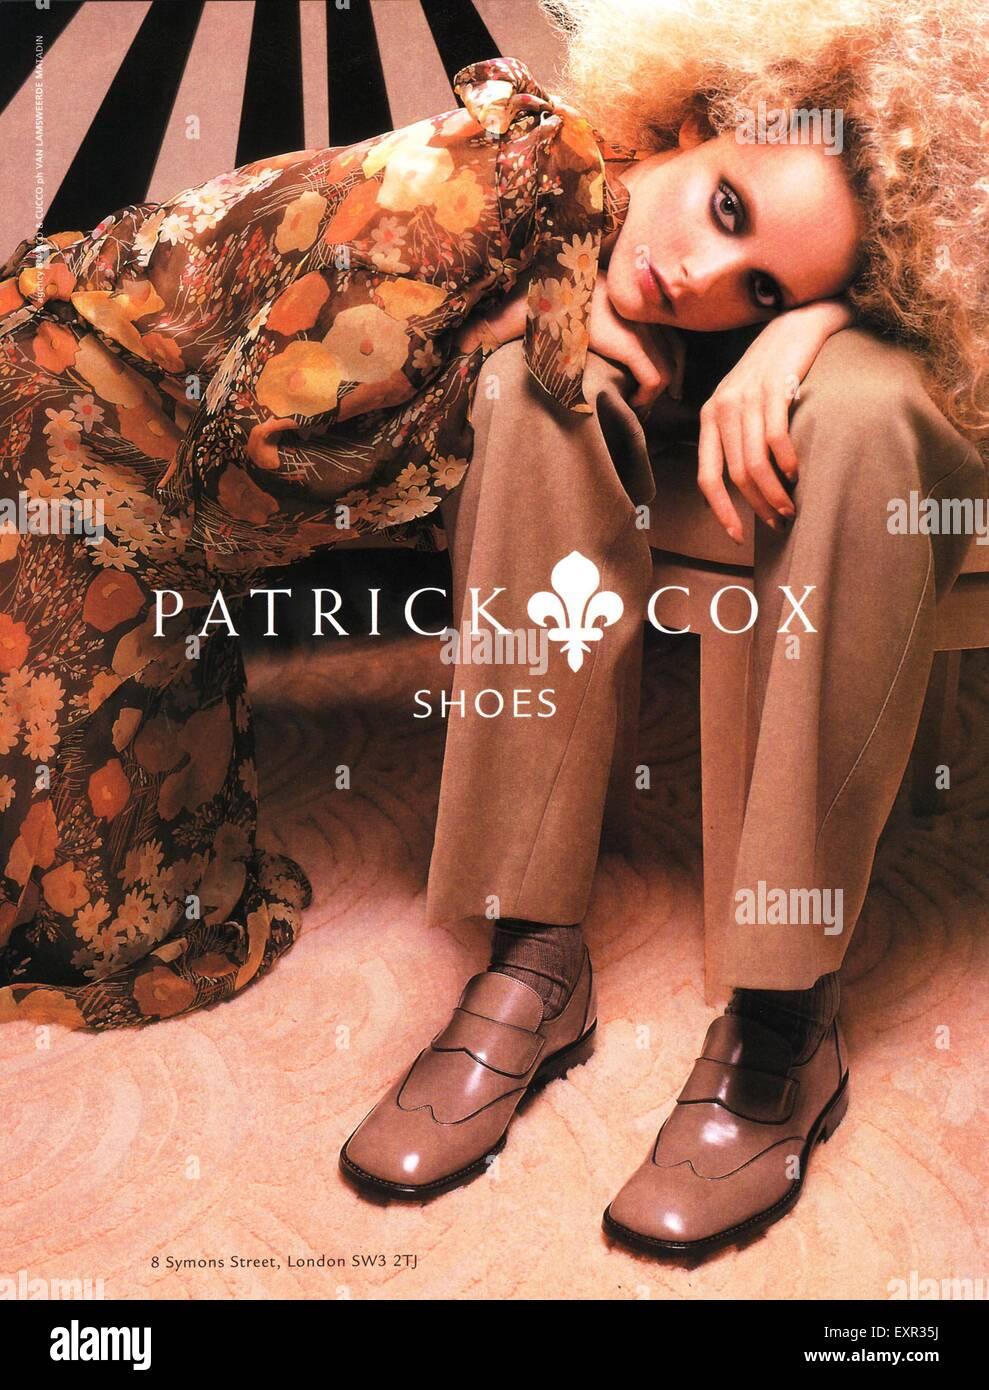 1990er Jahre UK Patrick Cox Magazin Anzeige Stockbild